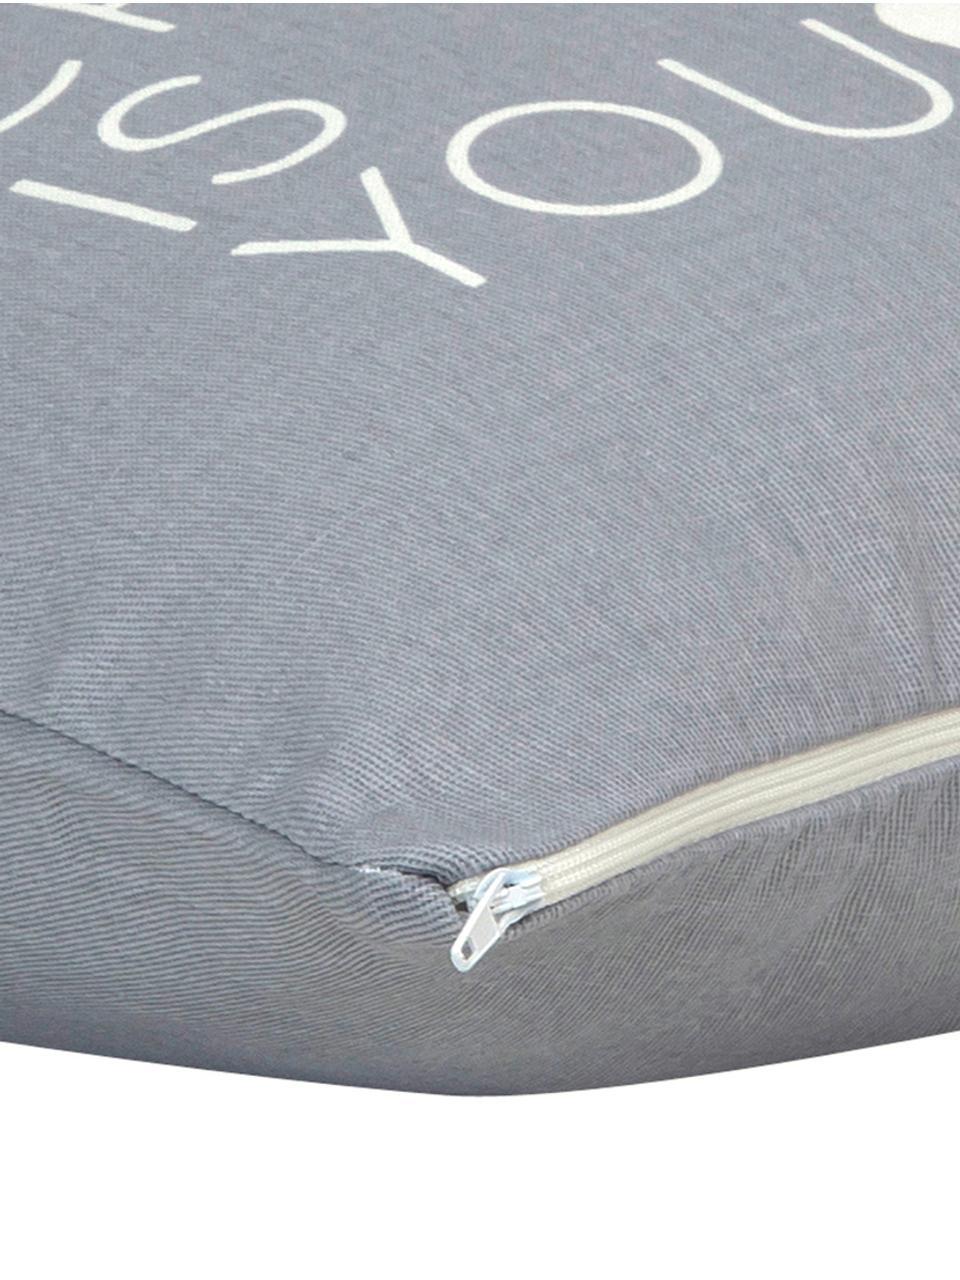 Funda de cojín All IWant, 100%algodón, tela Panamá, Gris, crudo, An 40 x L 40 cm